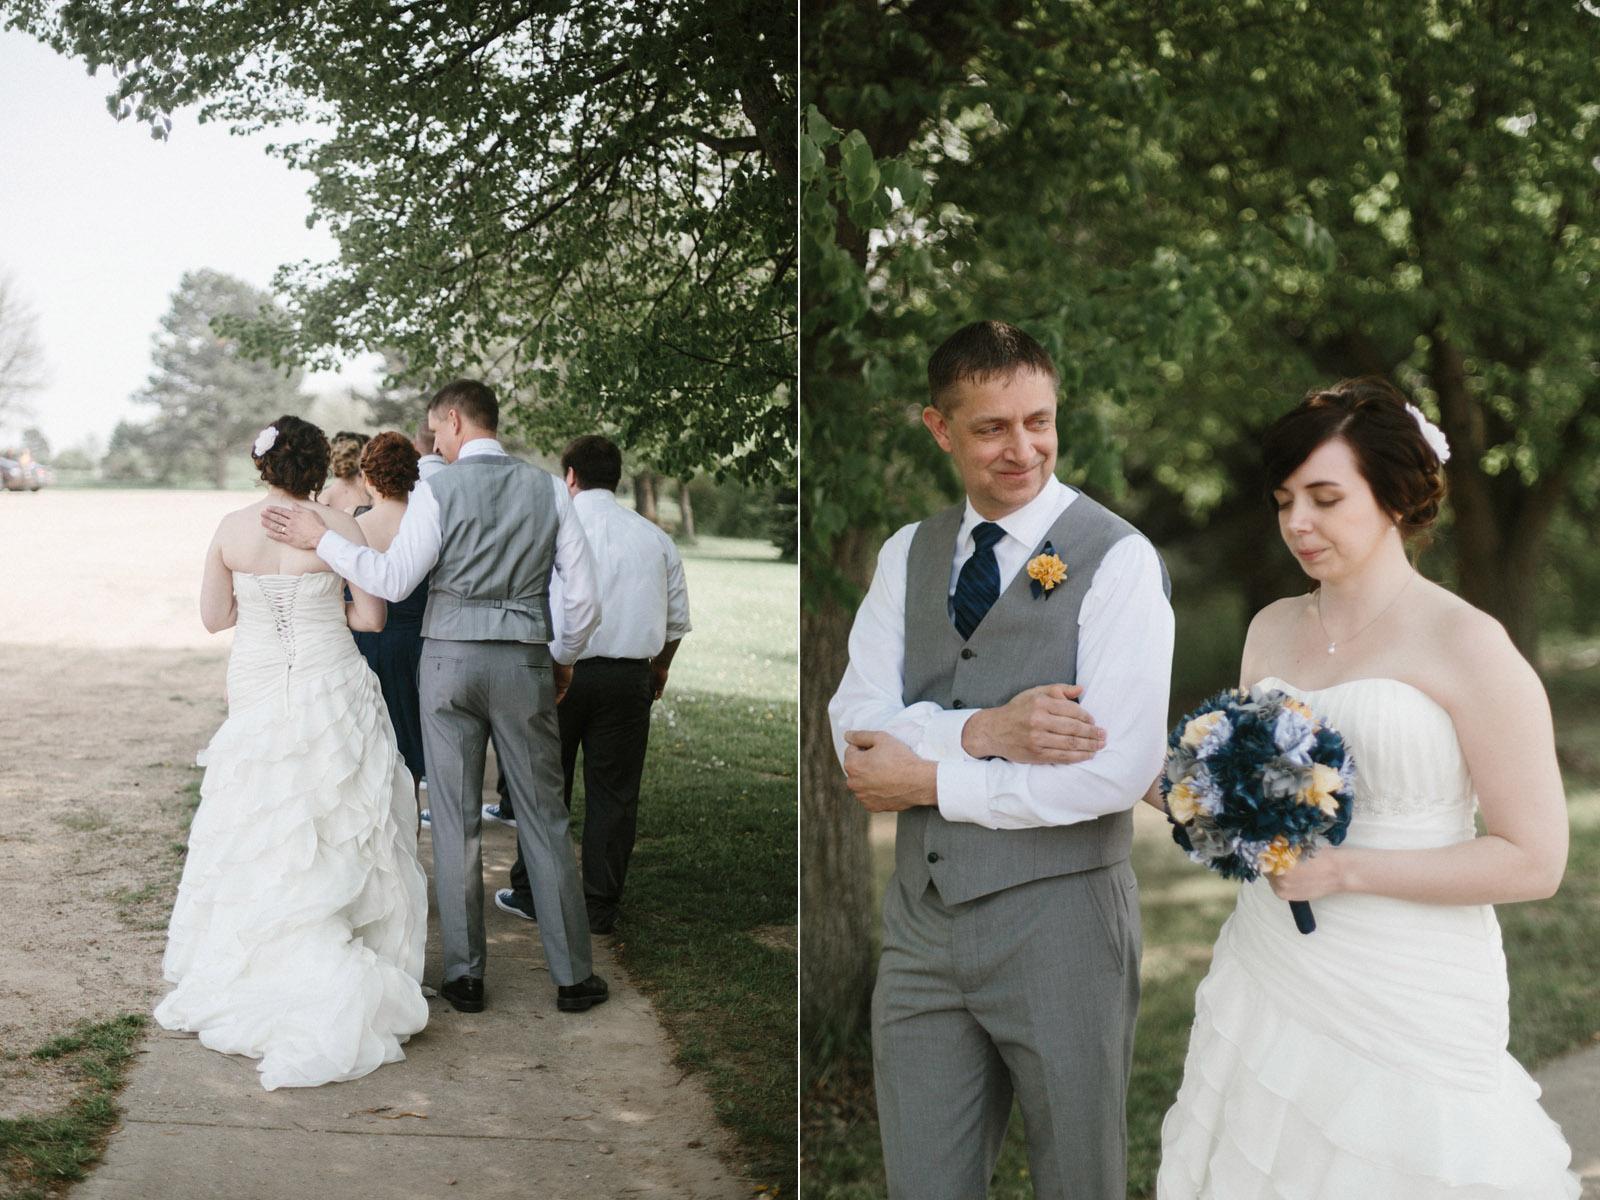 DesMoines_Wedding_Photographer_Spencer&Amanda_058.jpg